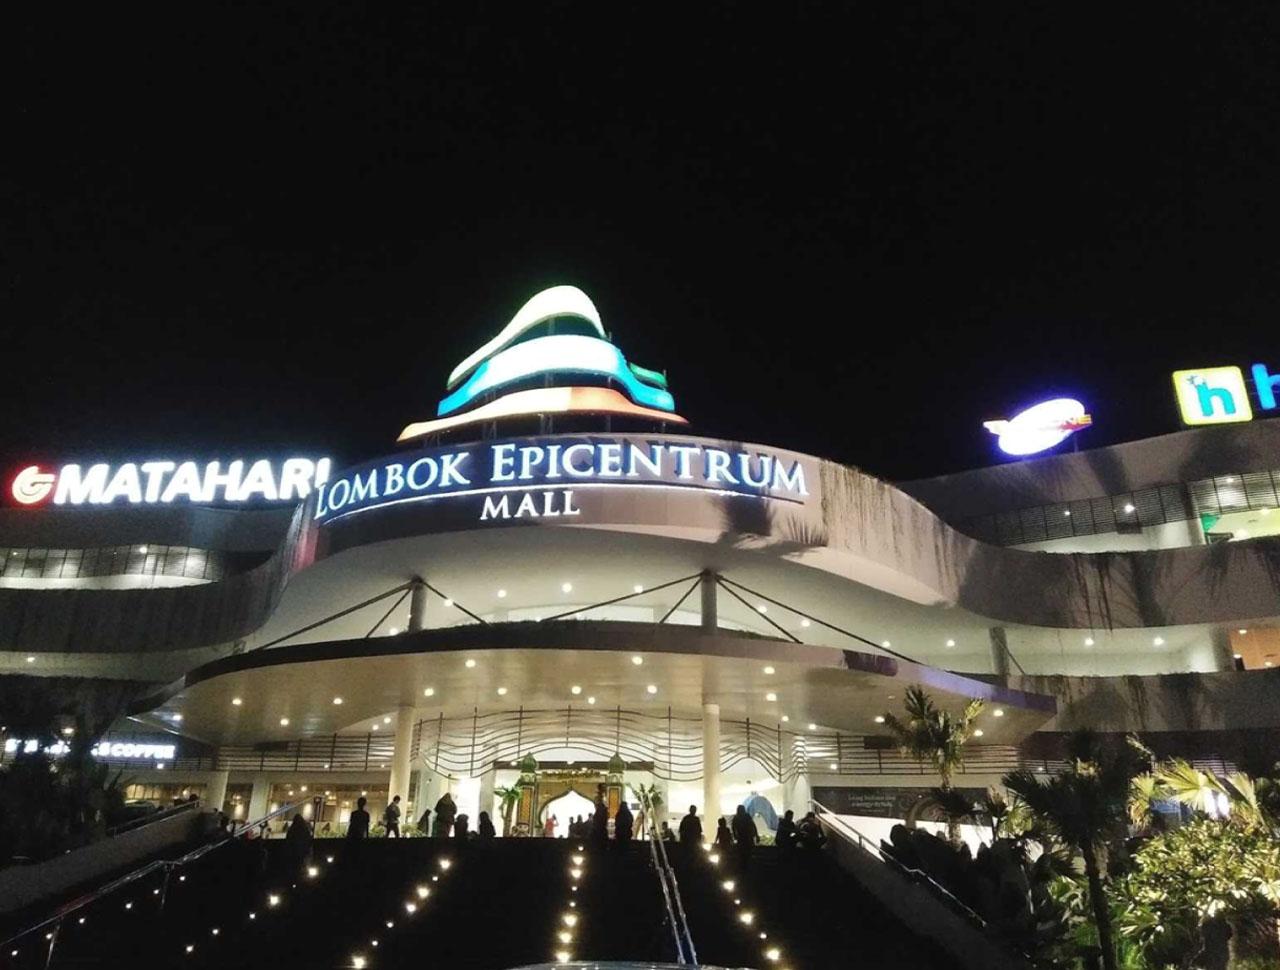 Lombok Epicentrum Mall, Indonesia